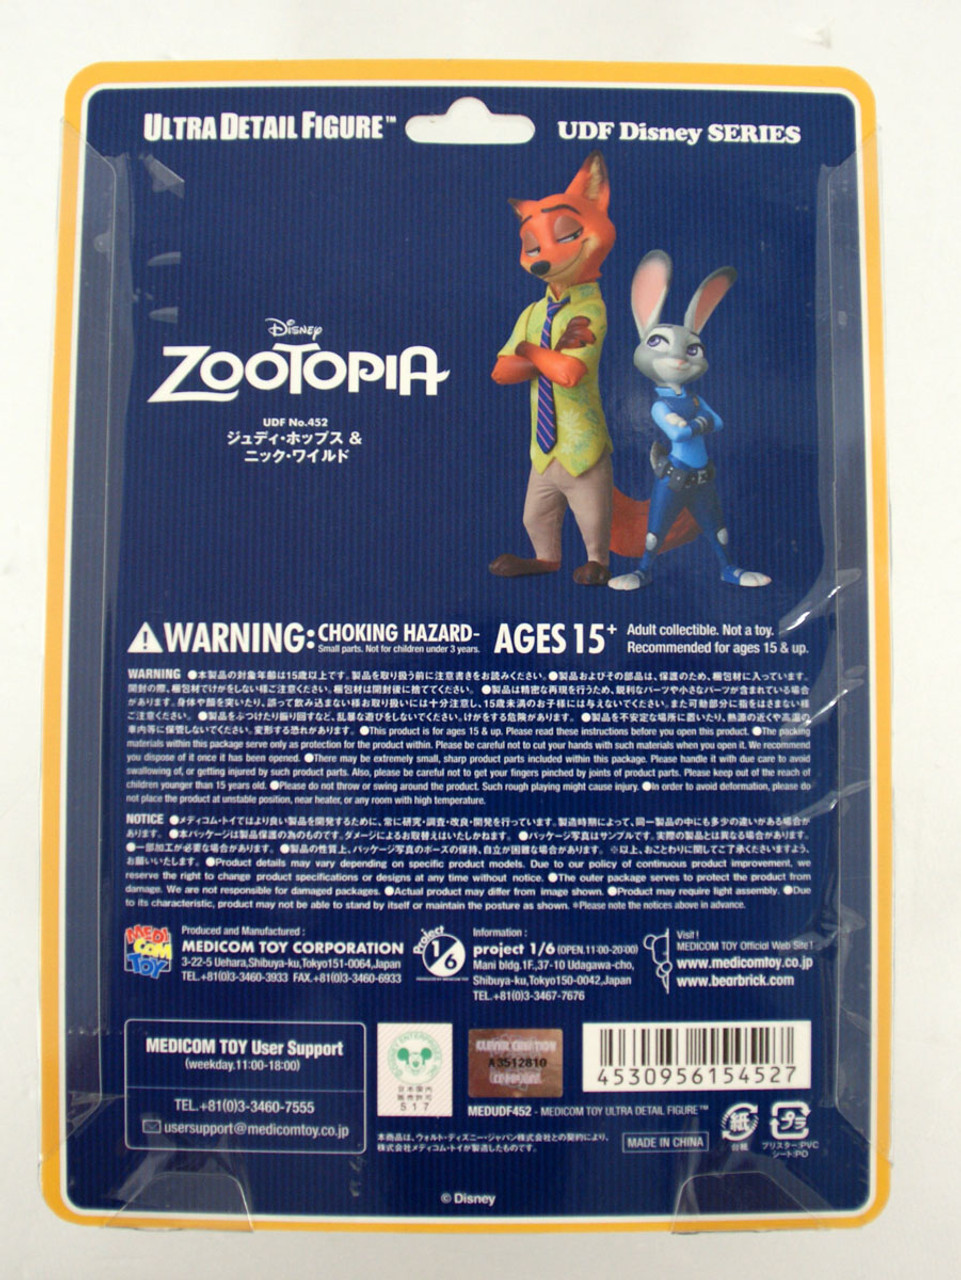 Medicom UDF-452 Ultra Detail Figure Disney 7 Zootopia Judy Hopps /& Nick Wilde